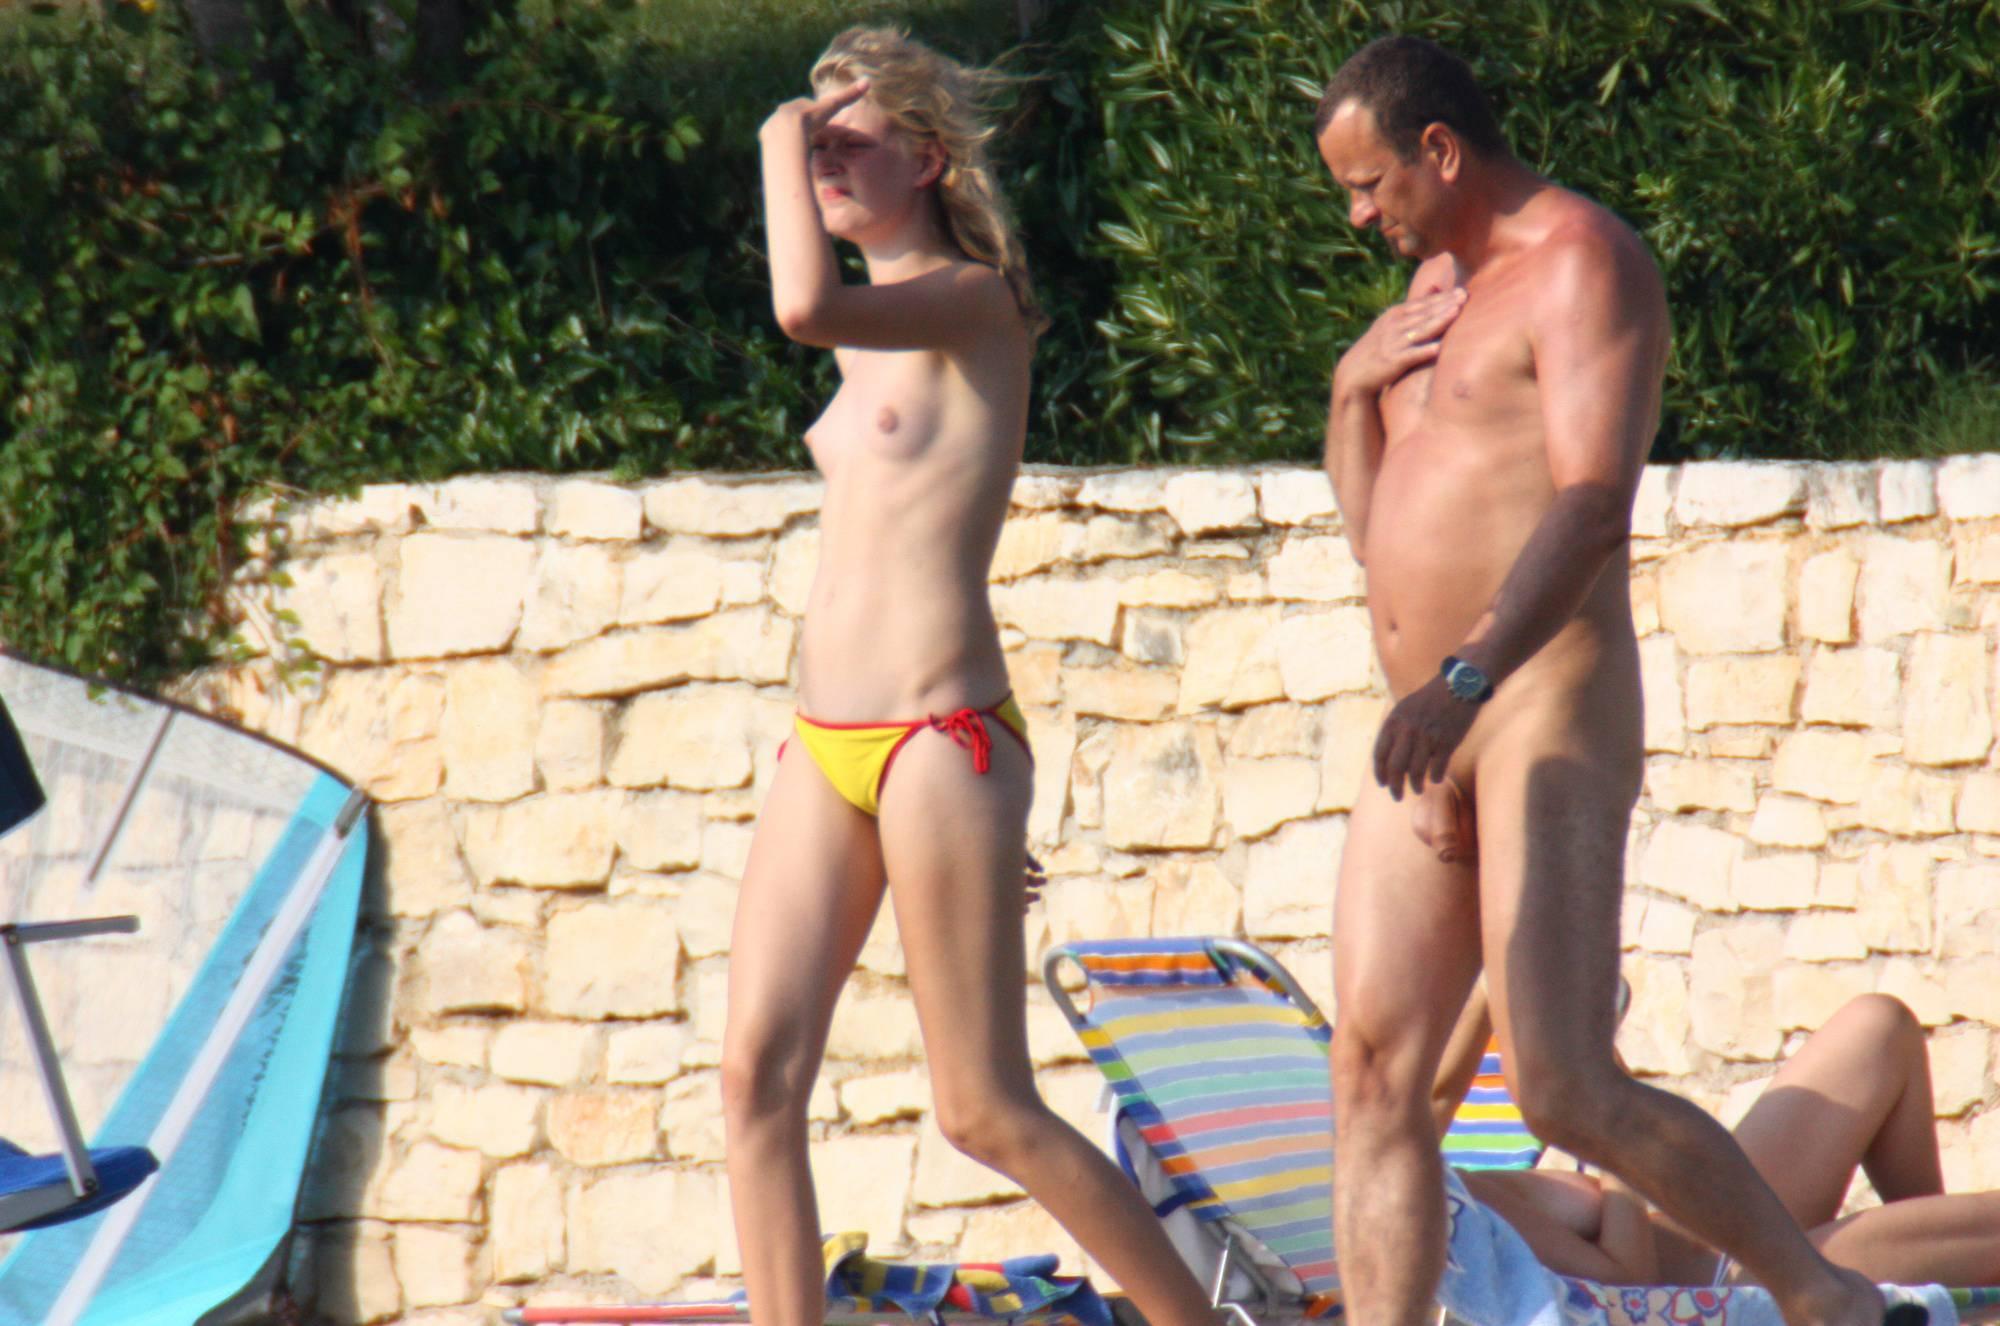 Naturist Topless Escorted - 3